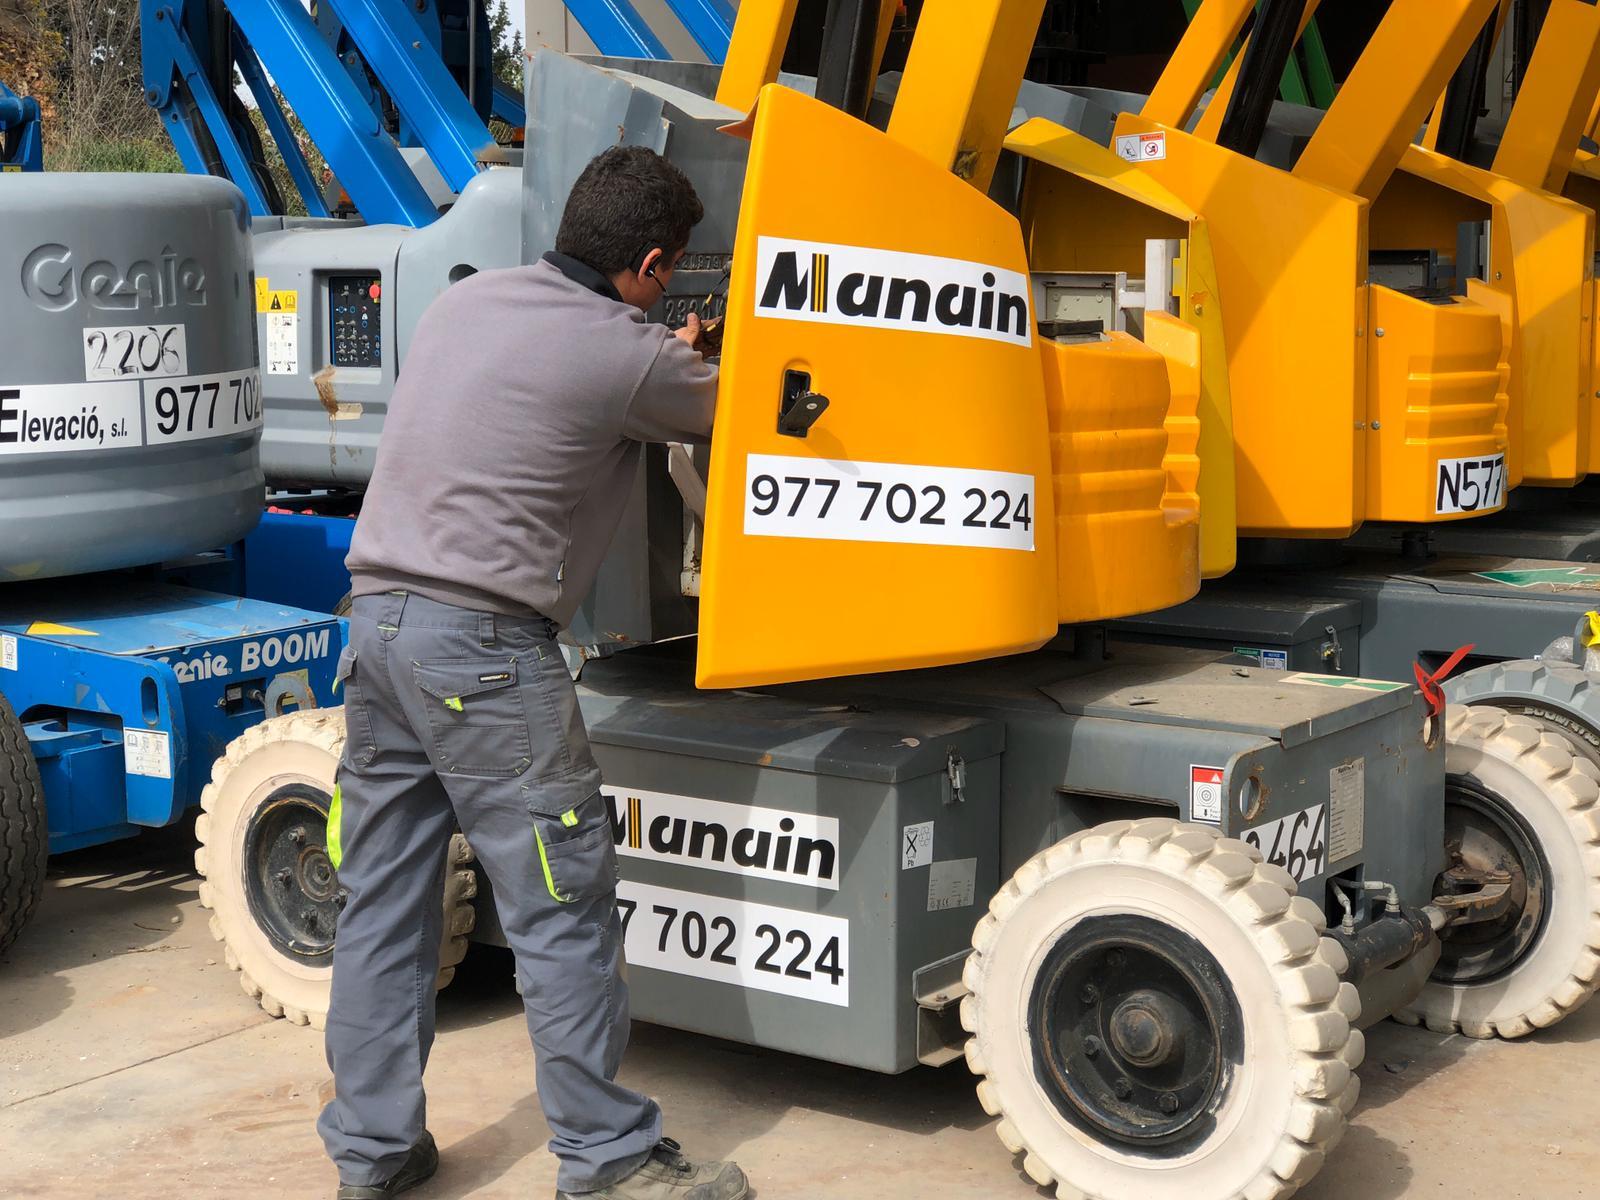 Mantenimiento preventivo de maquinaria – Manain